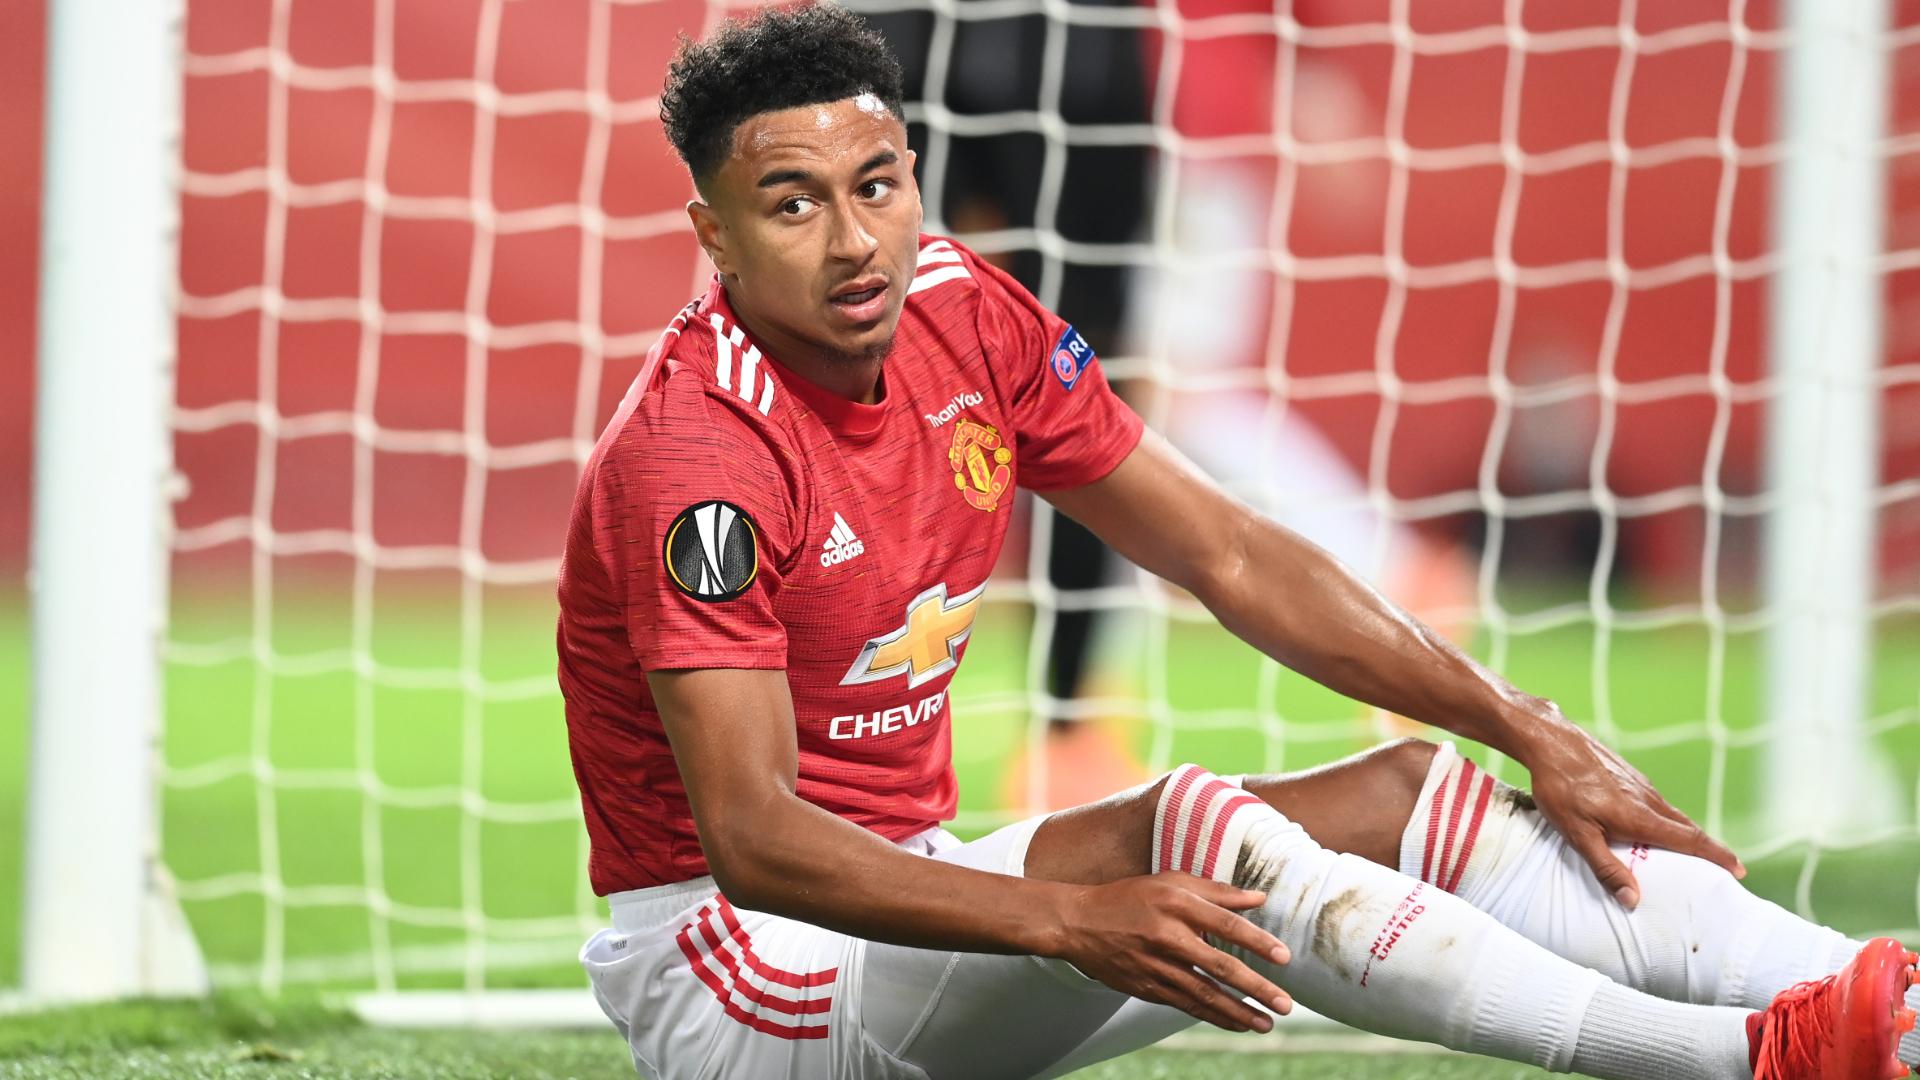 Manchester United V Lask Match Report 05 08 2020 Uefa Europa League Goal Com